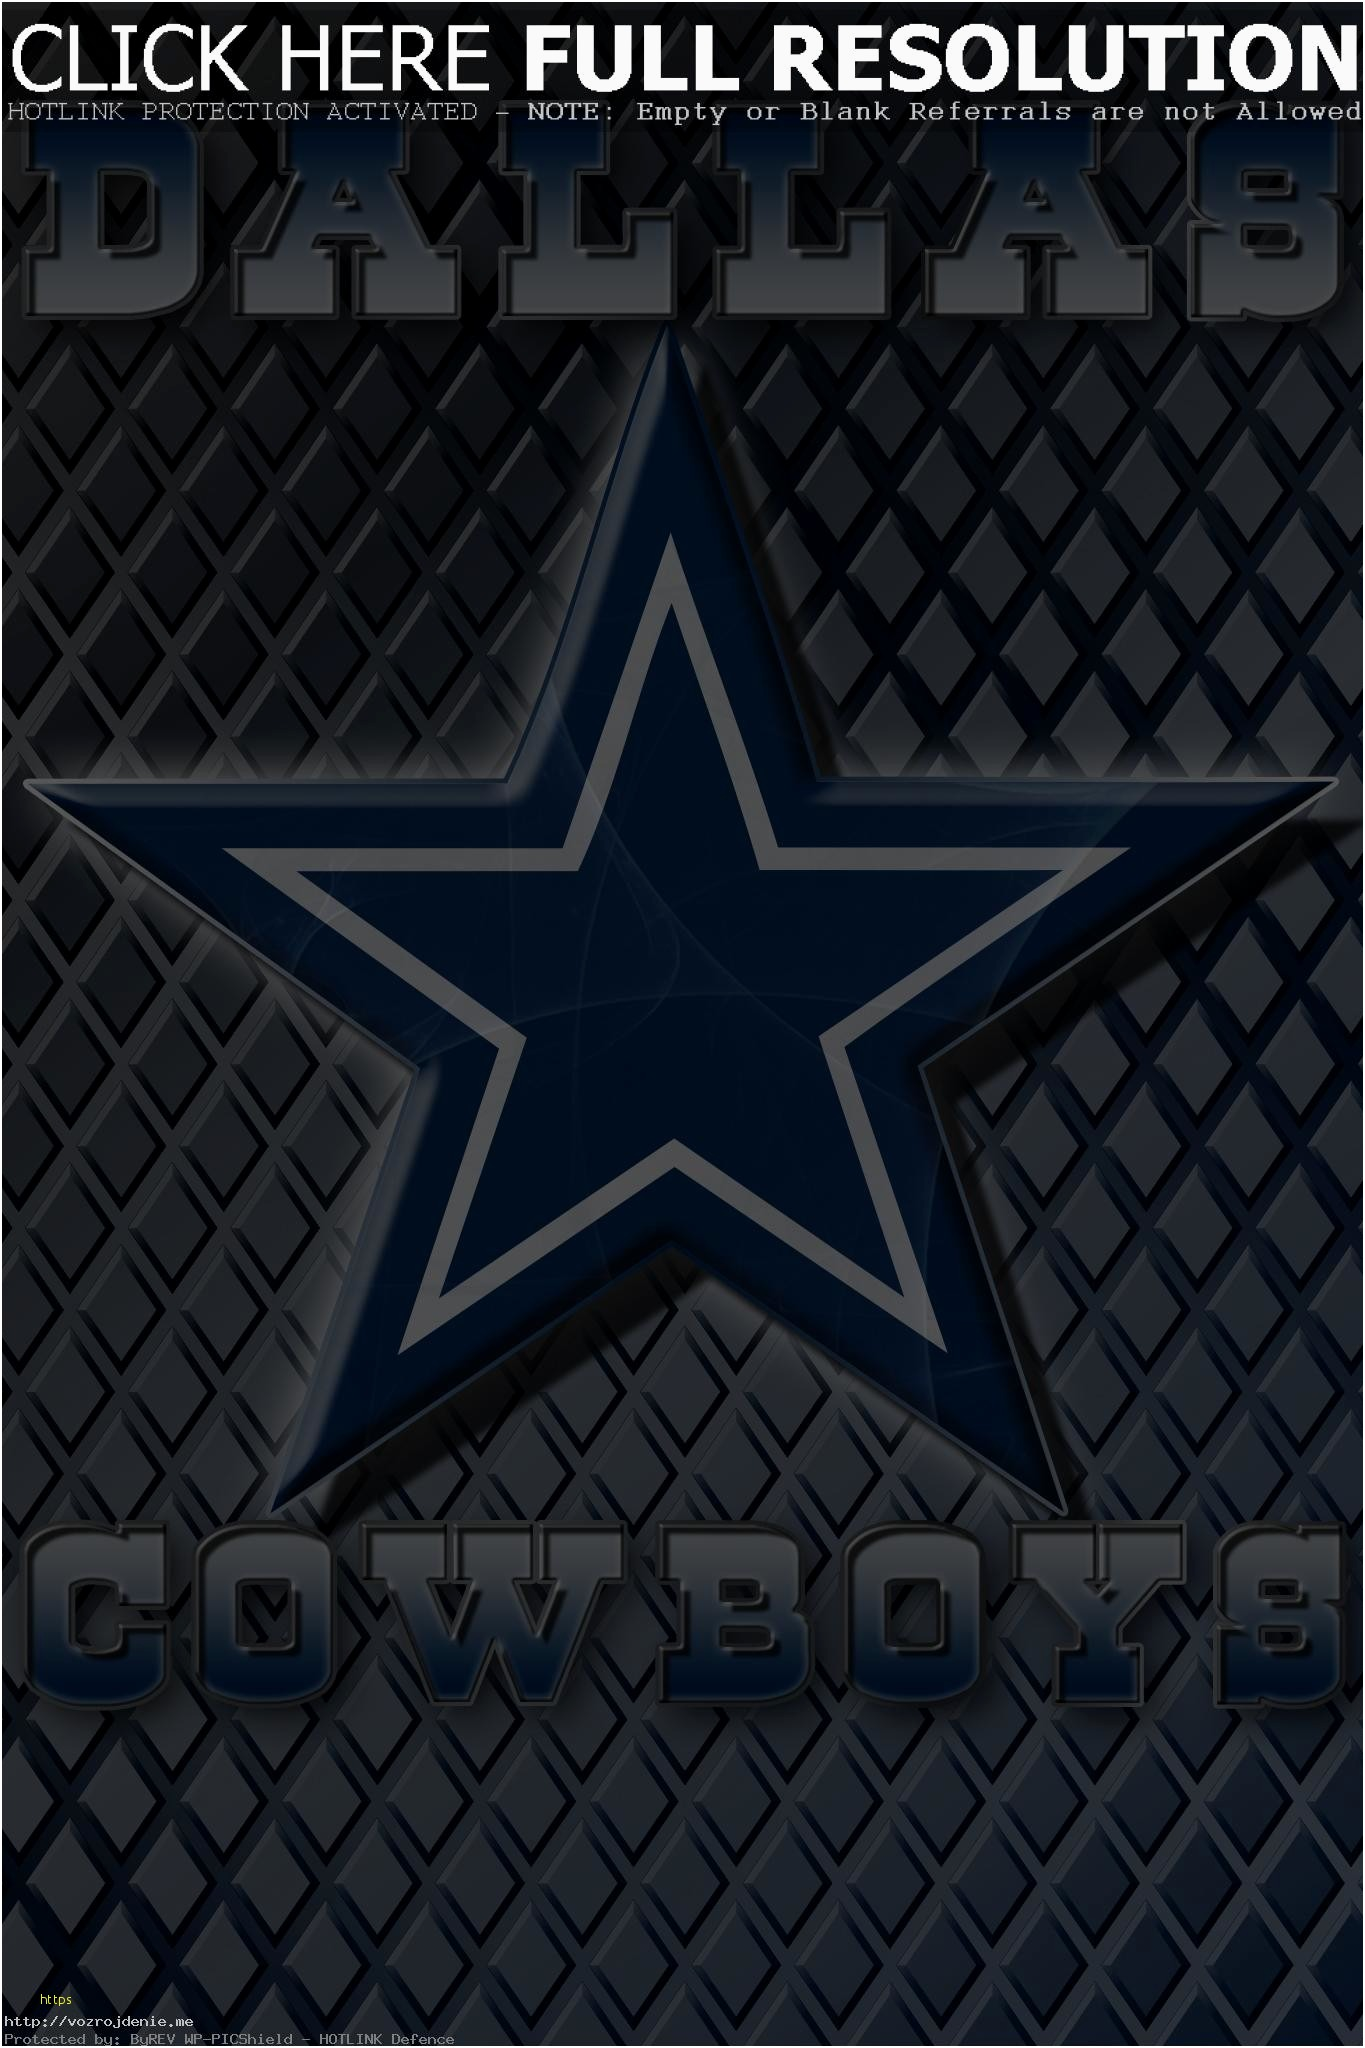 Dallas Cowboys Wallpaper Download Posted By Sarah Walker